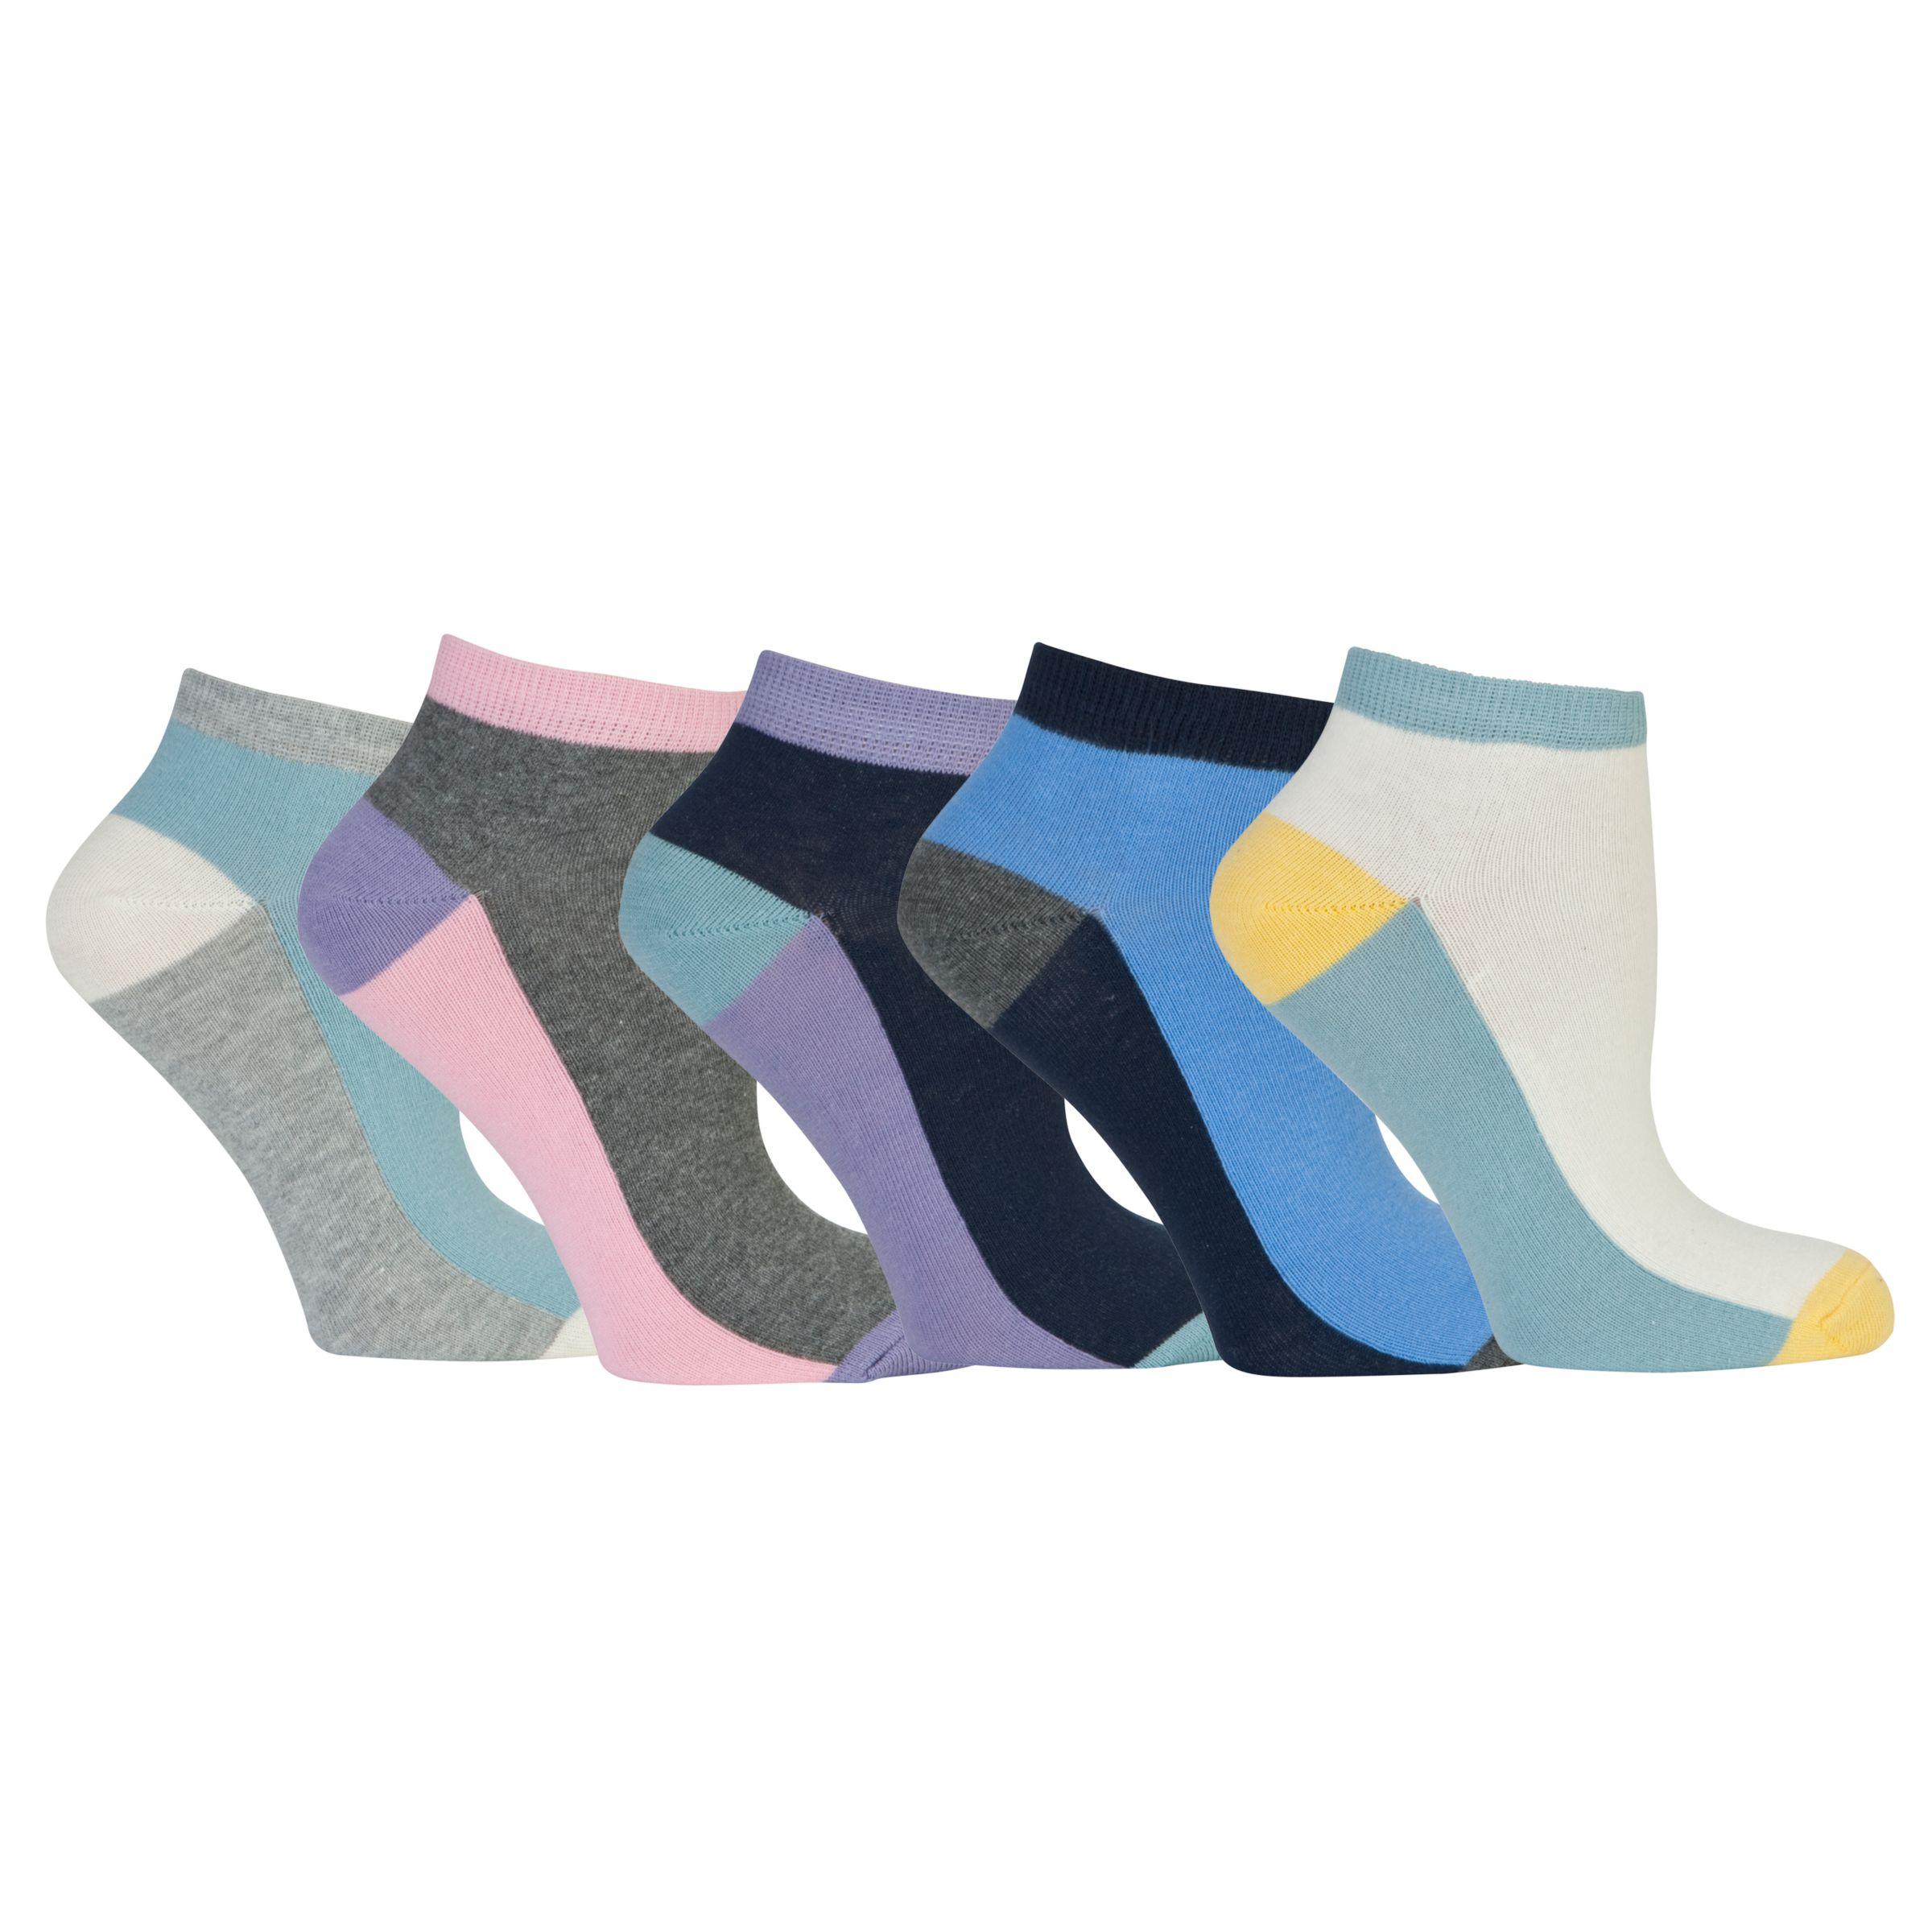 John Lewis Colour Block Trainer Socks, Pack of 5, Multi